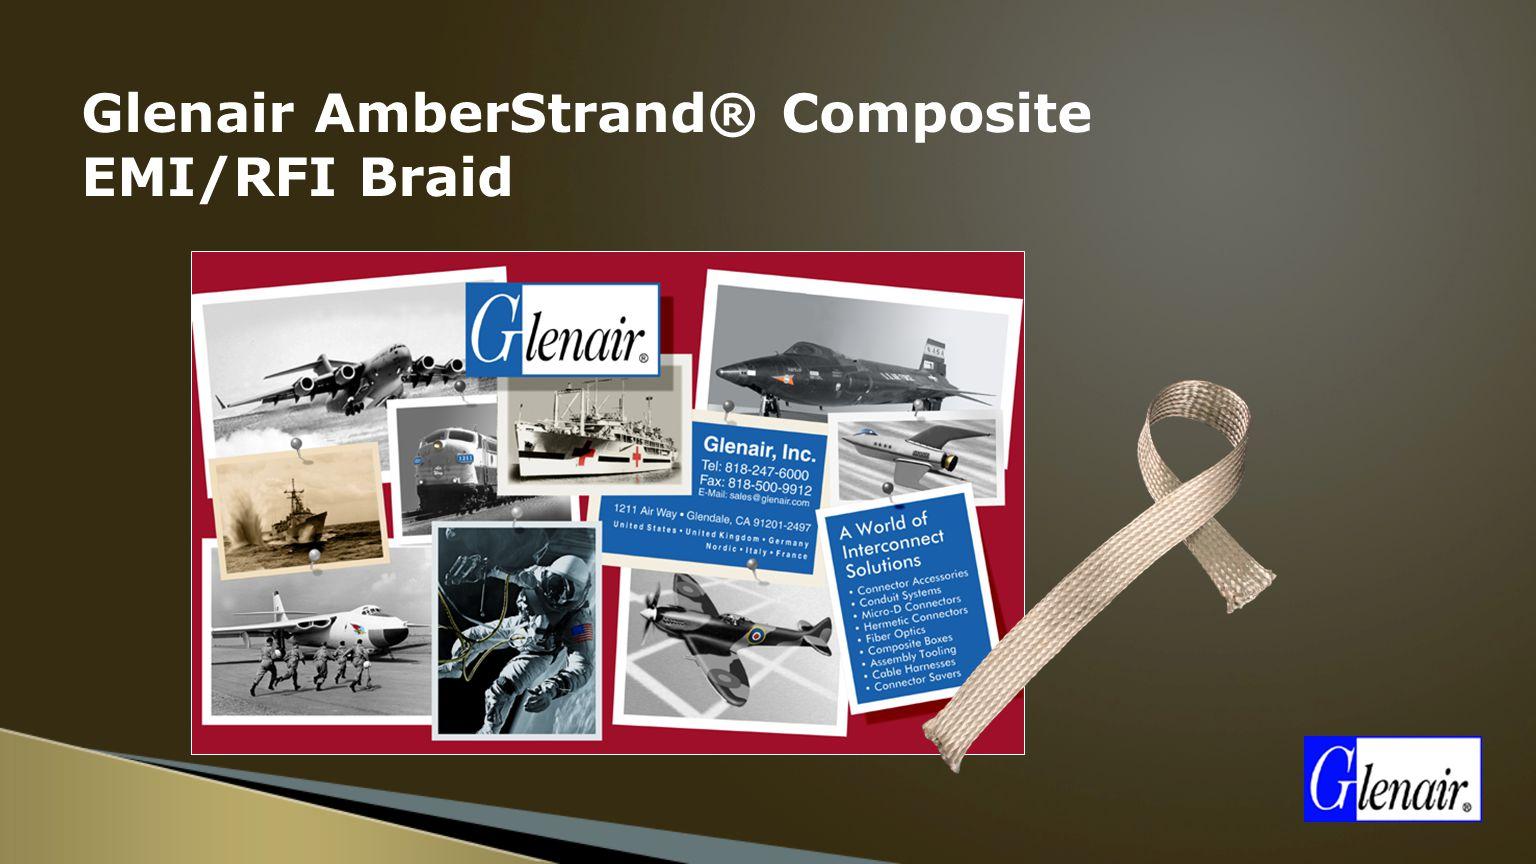 Glenair AmberStrand® Composite EMI/RFI Braid